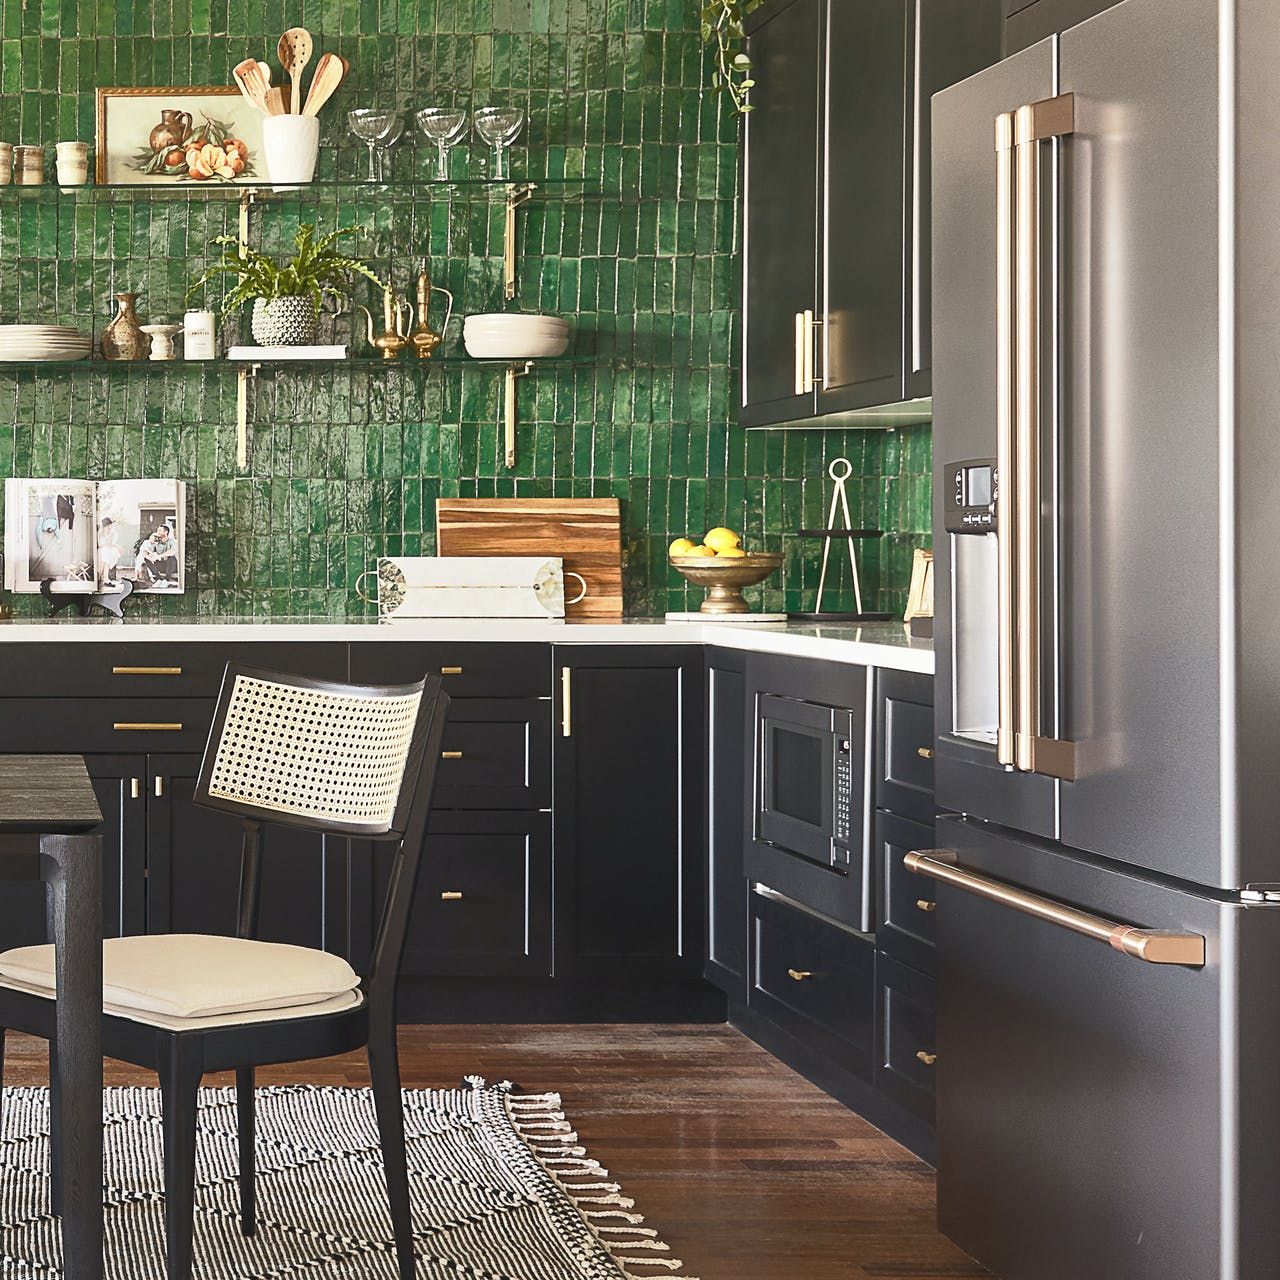 Bright green tile with Matte Black appliances